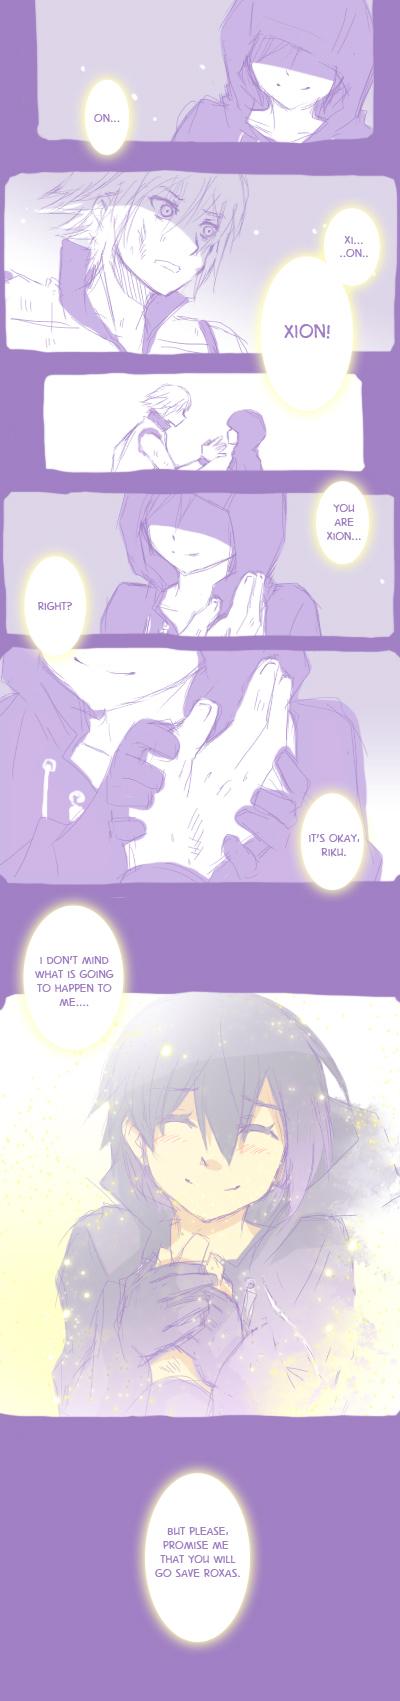 KH3D Random manga by semokan